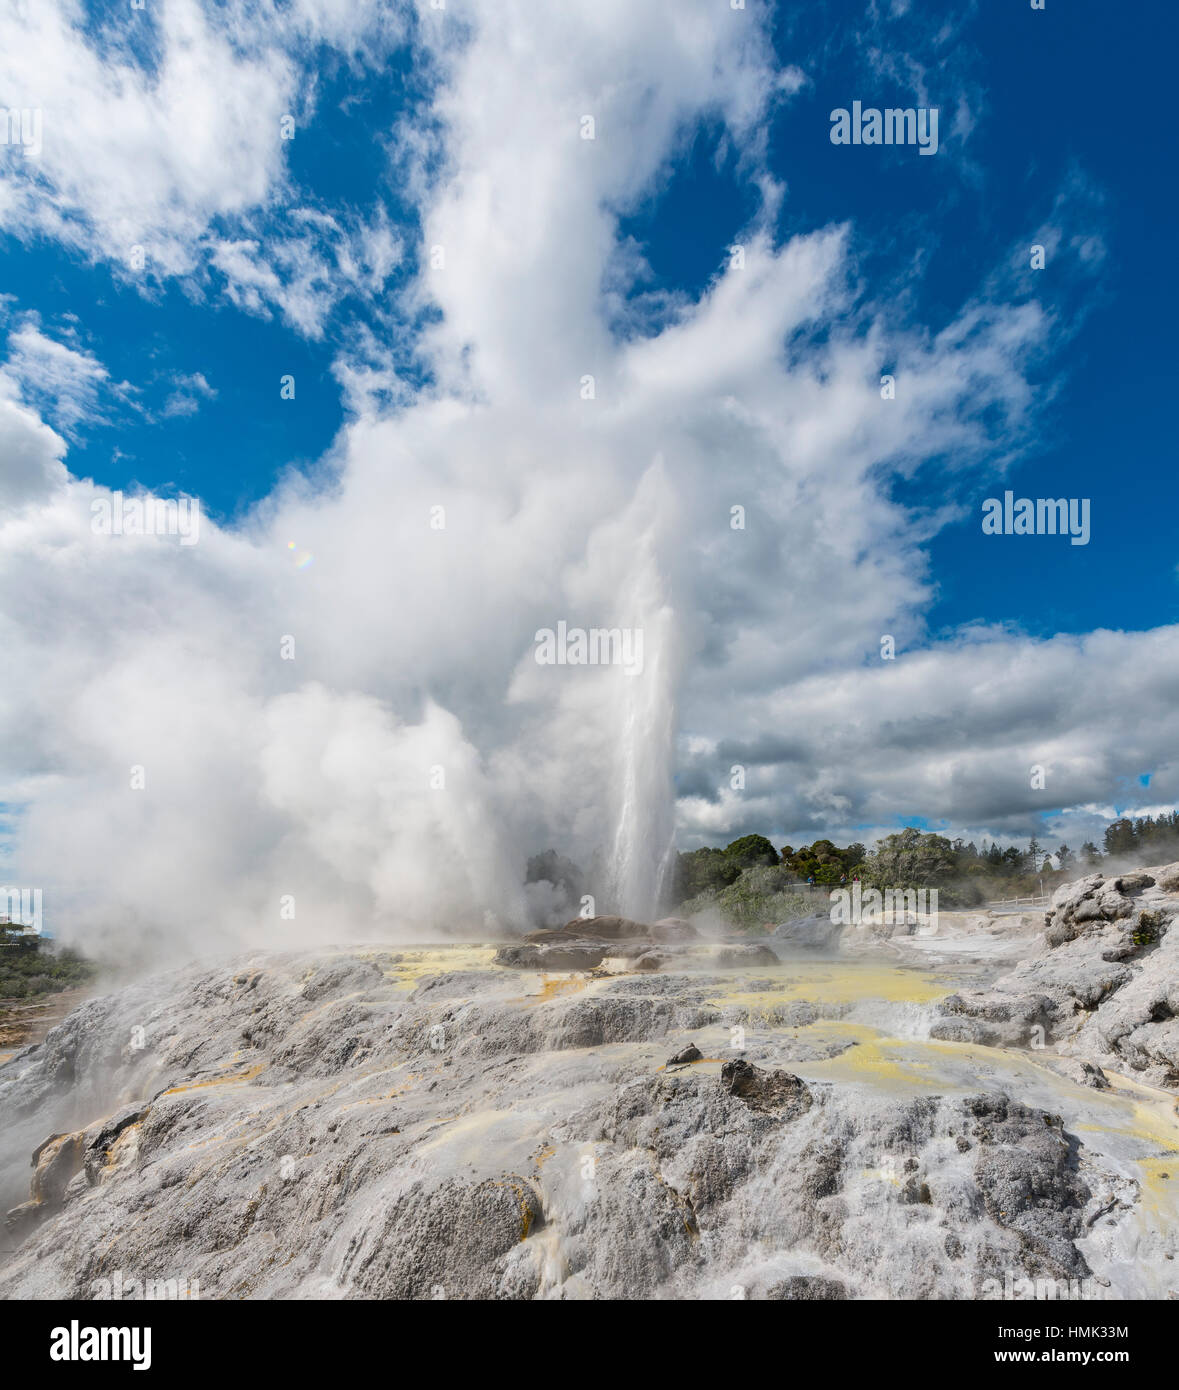 Water fountain and vapor, Pohutu Geyser and Prince of Wales Feathers Geyser, Te Puia, Whakarewarewa, Rotorua, New - Stock Image